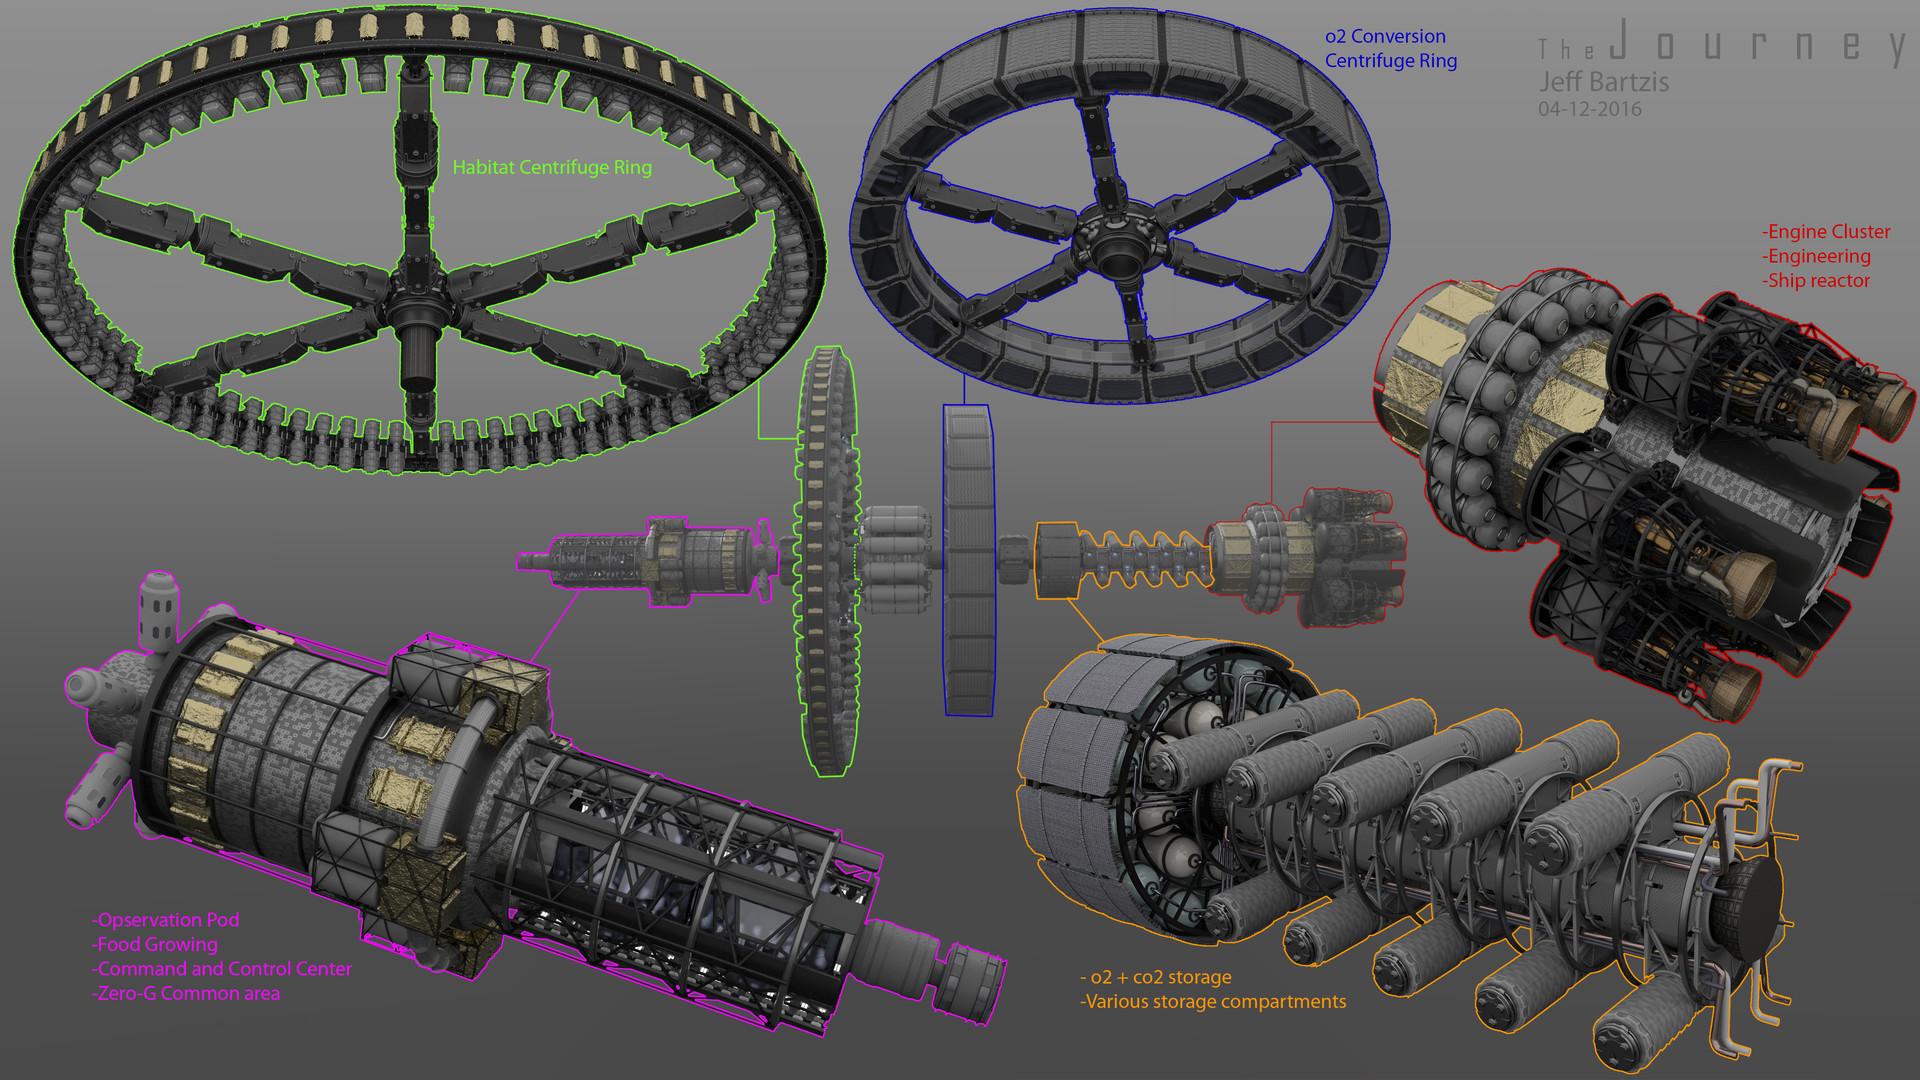 Jeff bartzis tj ship completedshader componentbreakdown 001